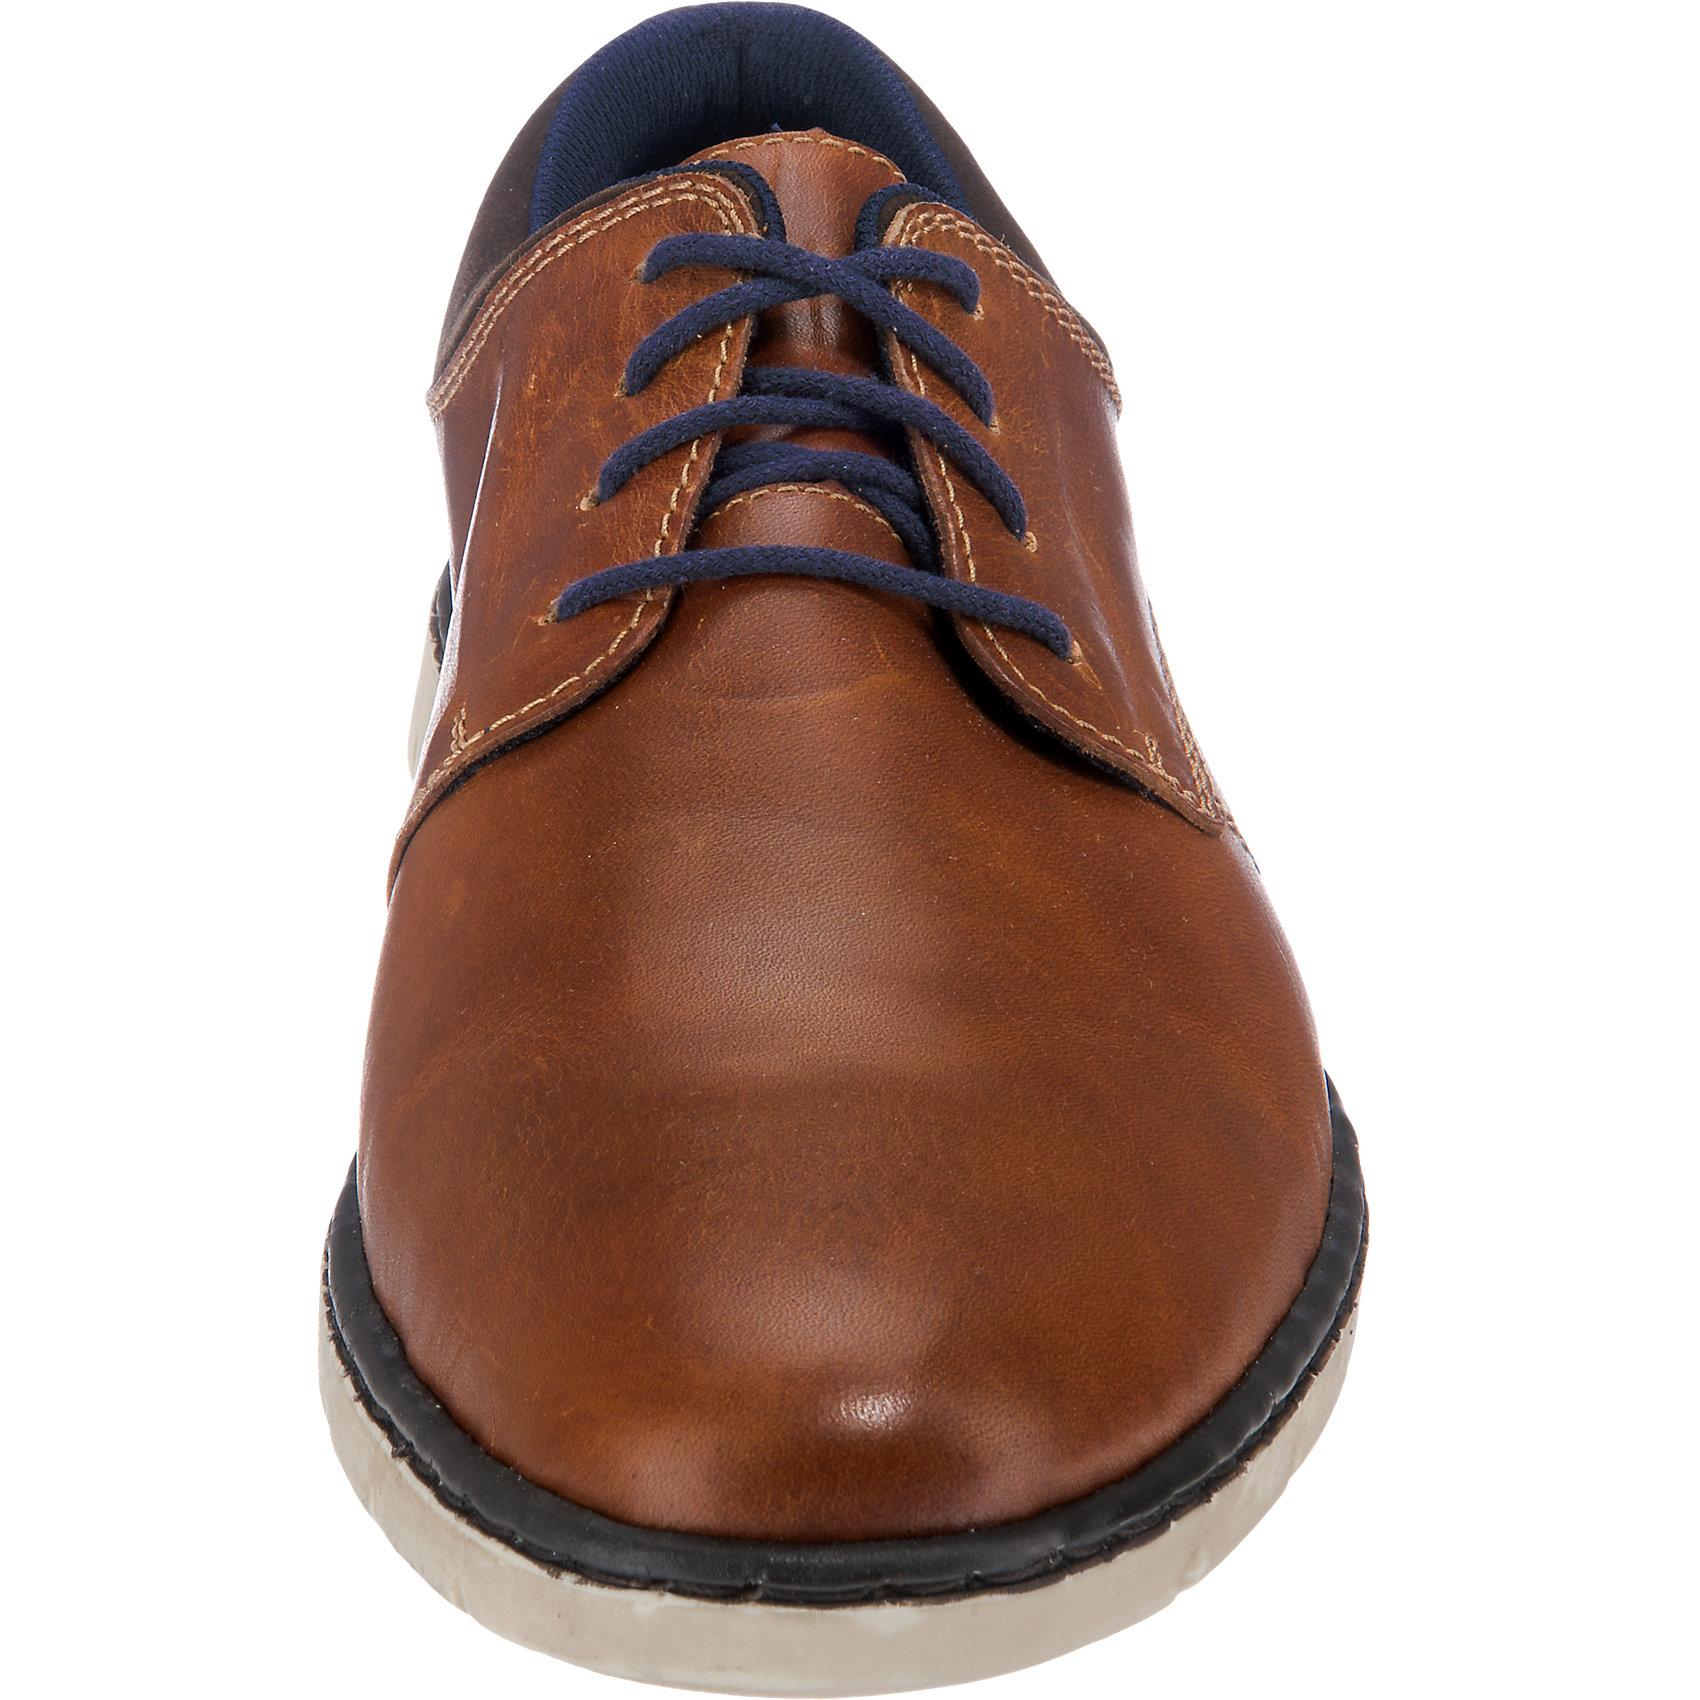 Neu rieker Freizeit Freizeit rieker Schuhe braun-kombi 5756569 0361ae